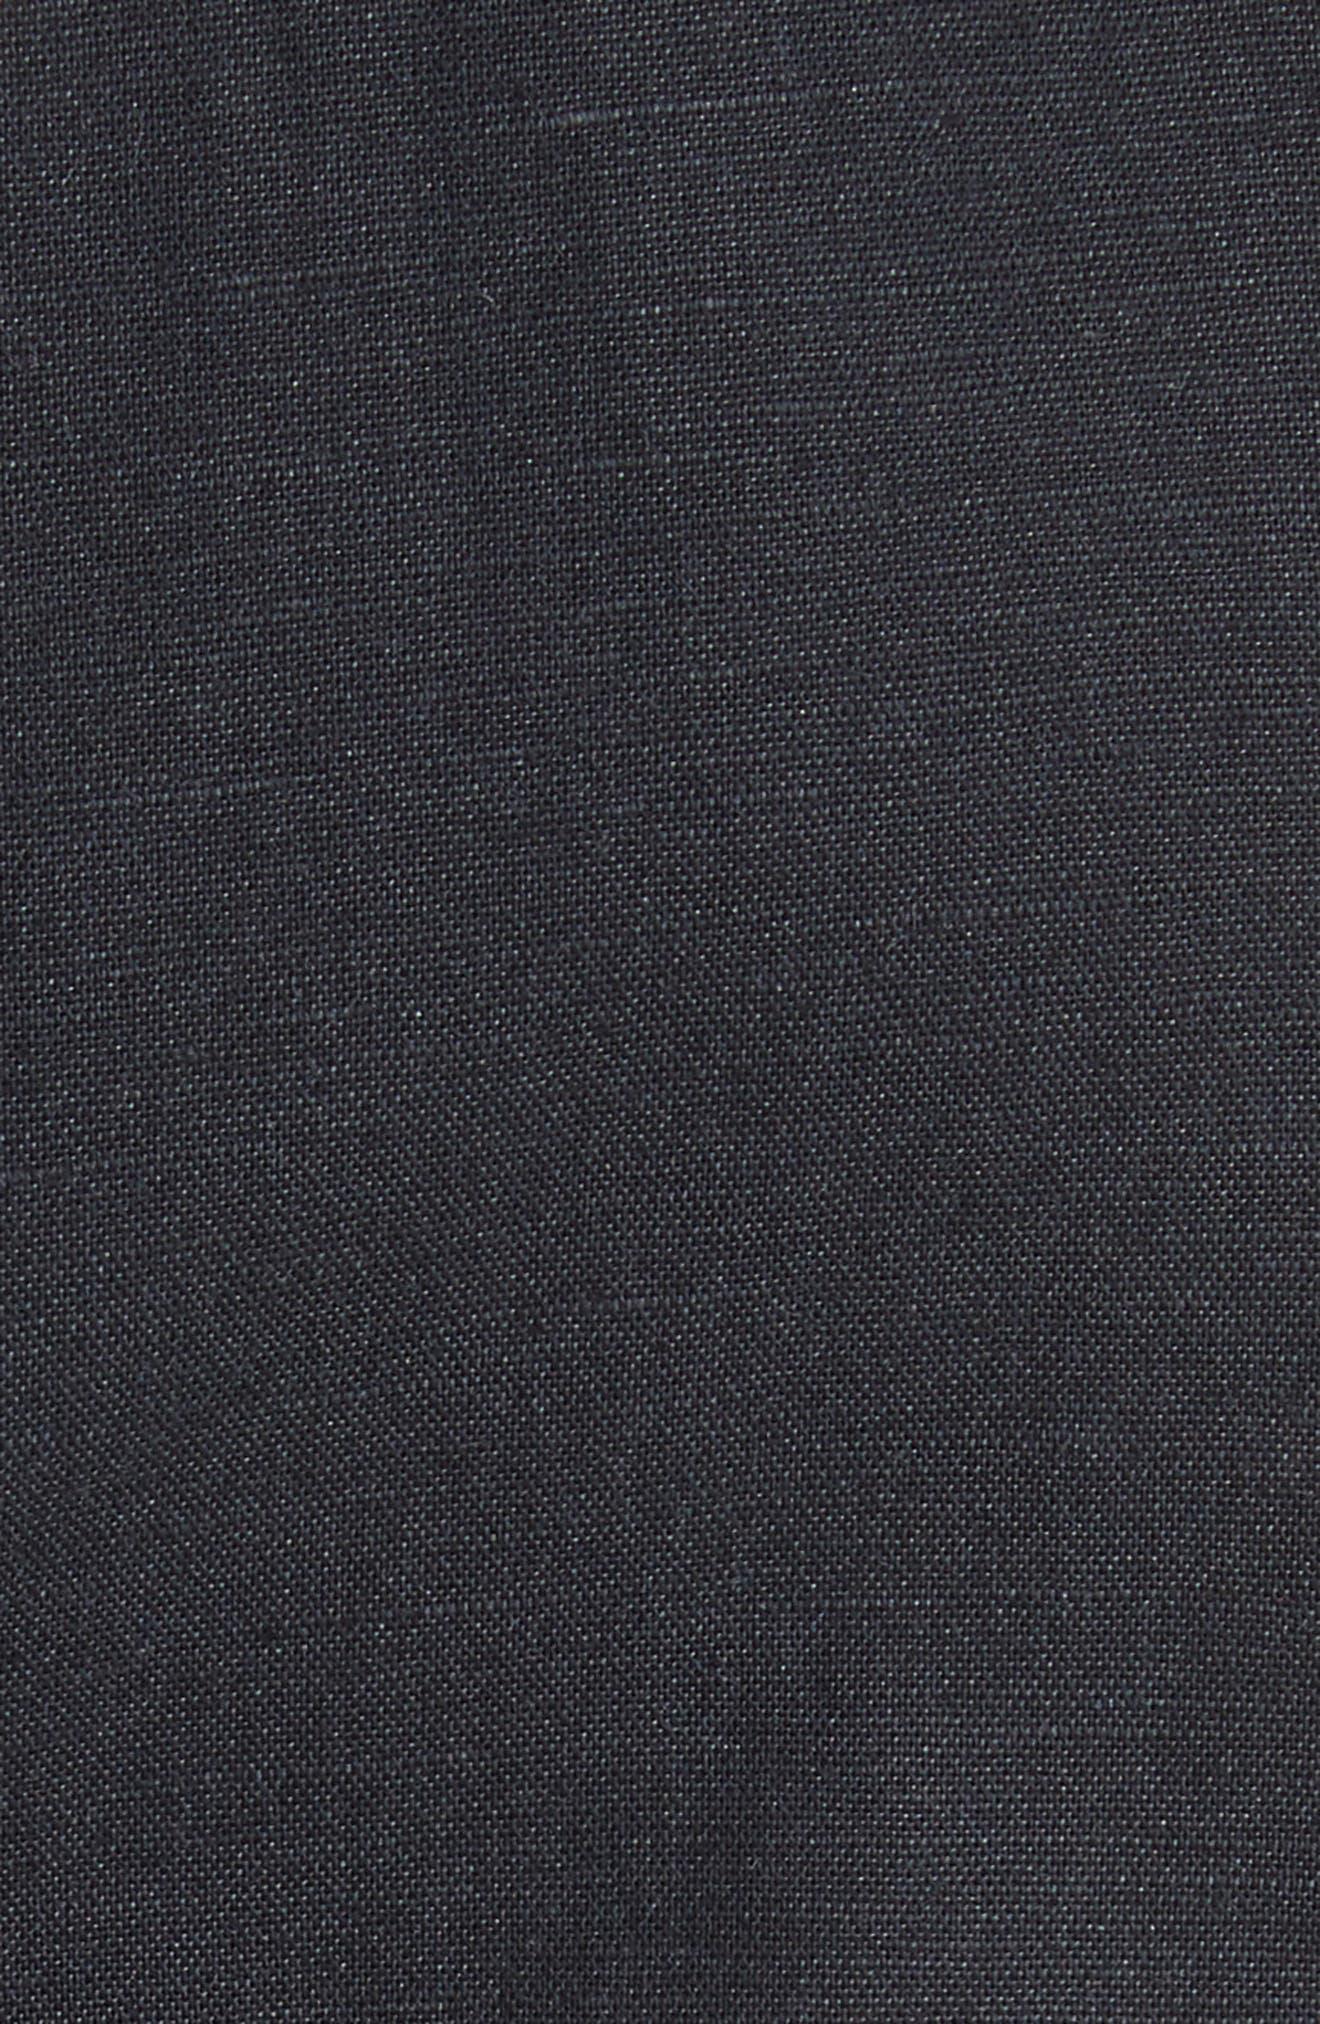 Circular Print Asymmetrical Draped Dress,                             Alternate thumbnail 5, color,